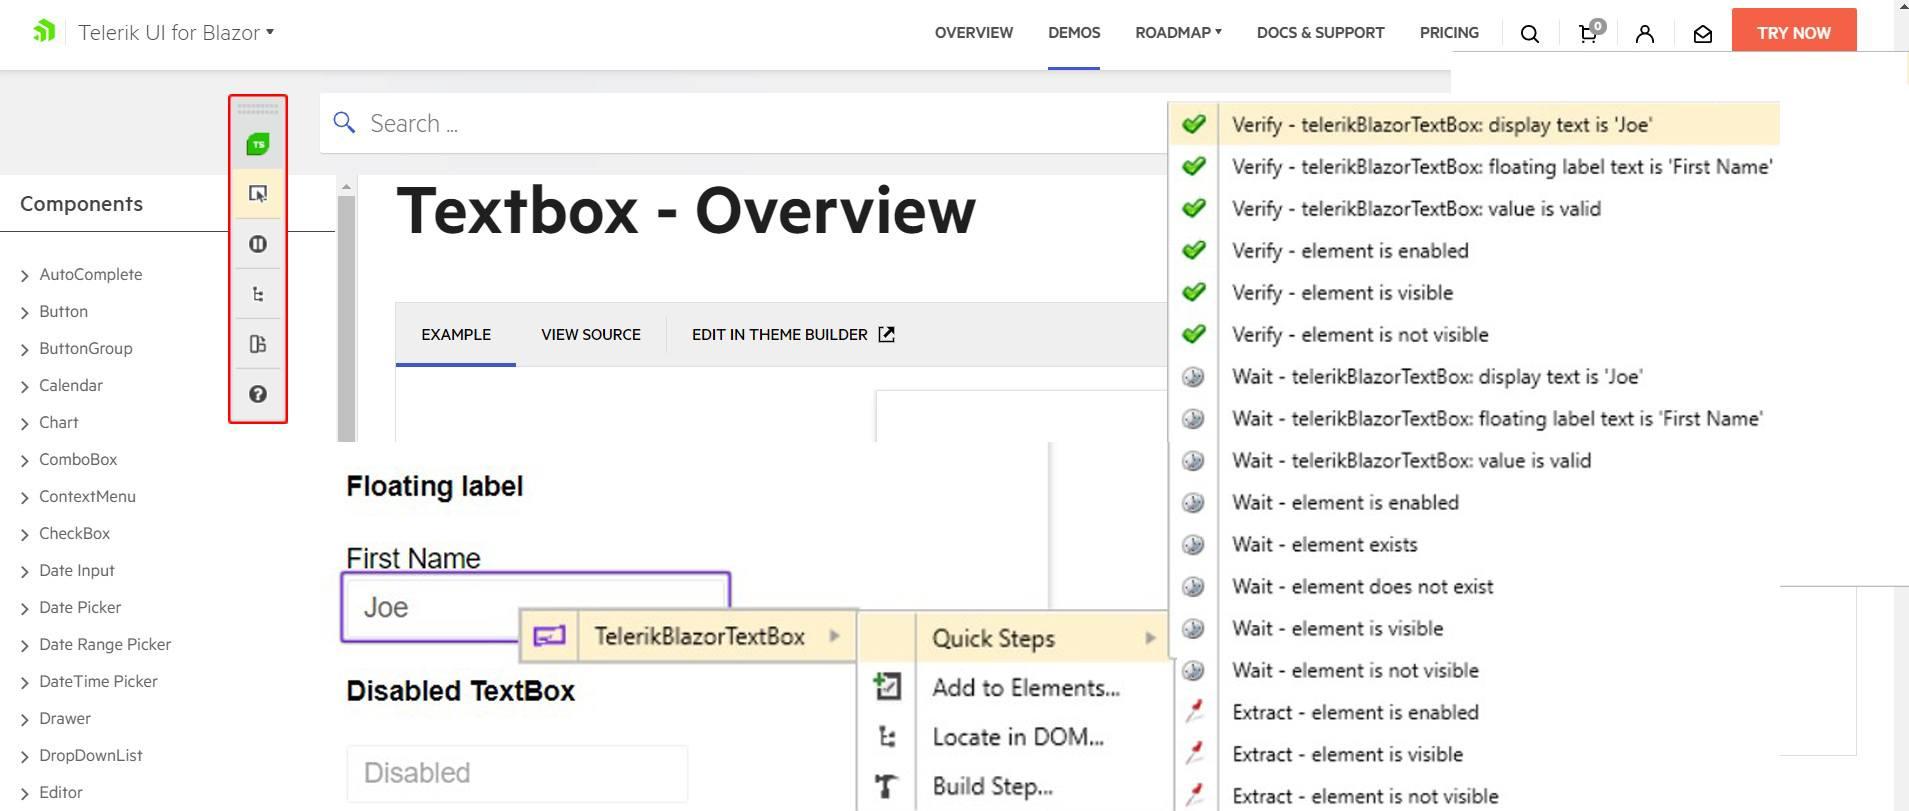 Translator for Telerik UI for Blazor TextBox